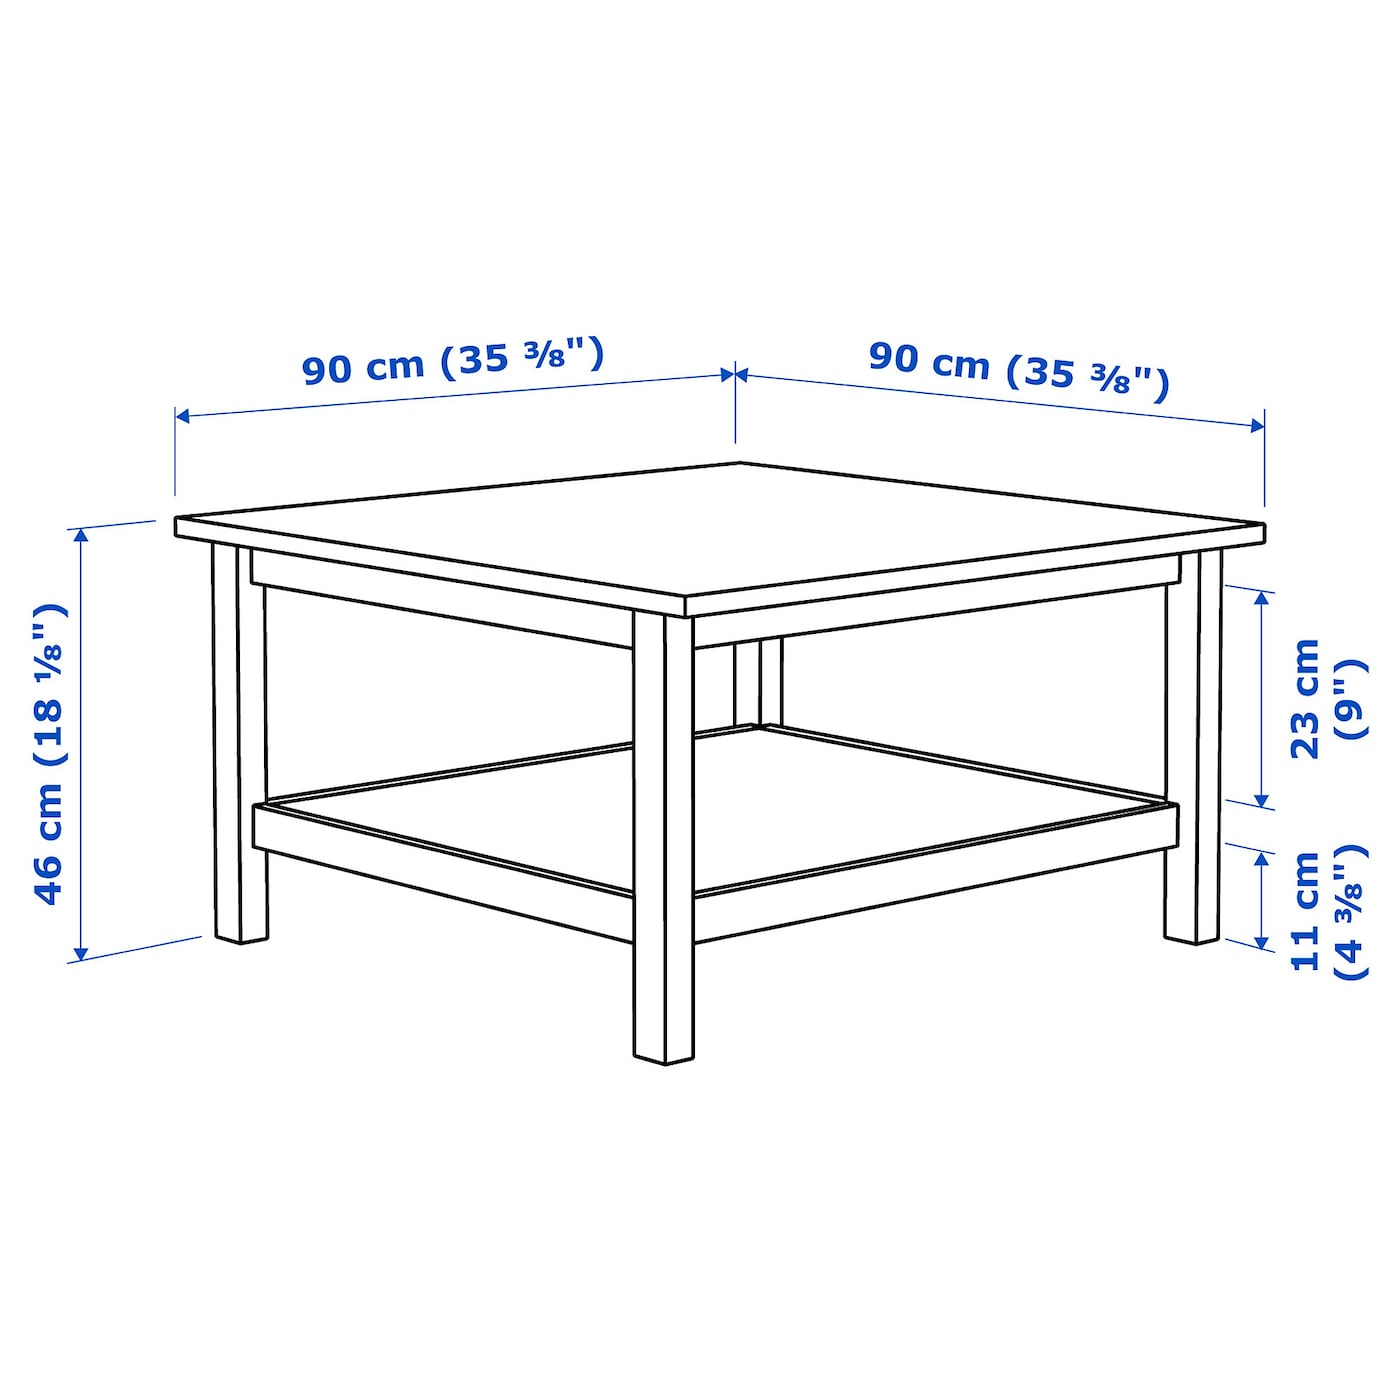 Hemnes Coffee Table White Stain 90x90 Cm Ikea [ 1400 x 1400 Pixel ]